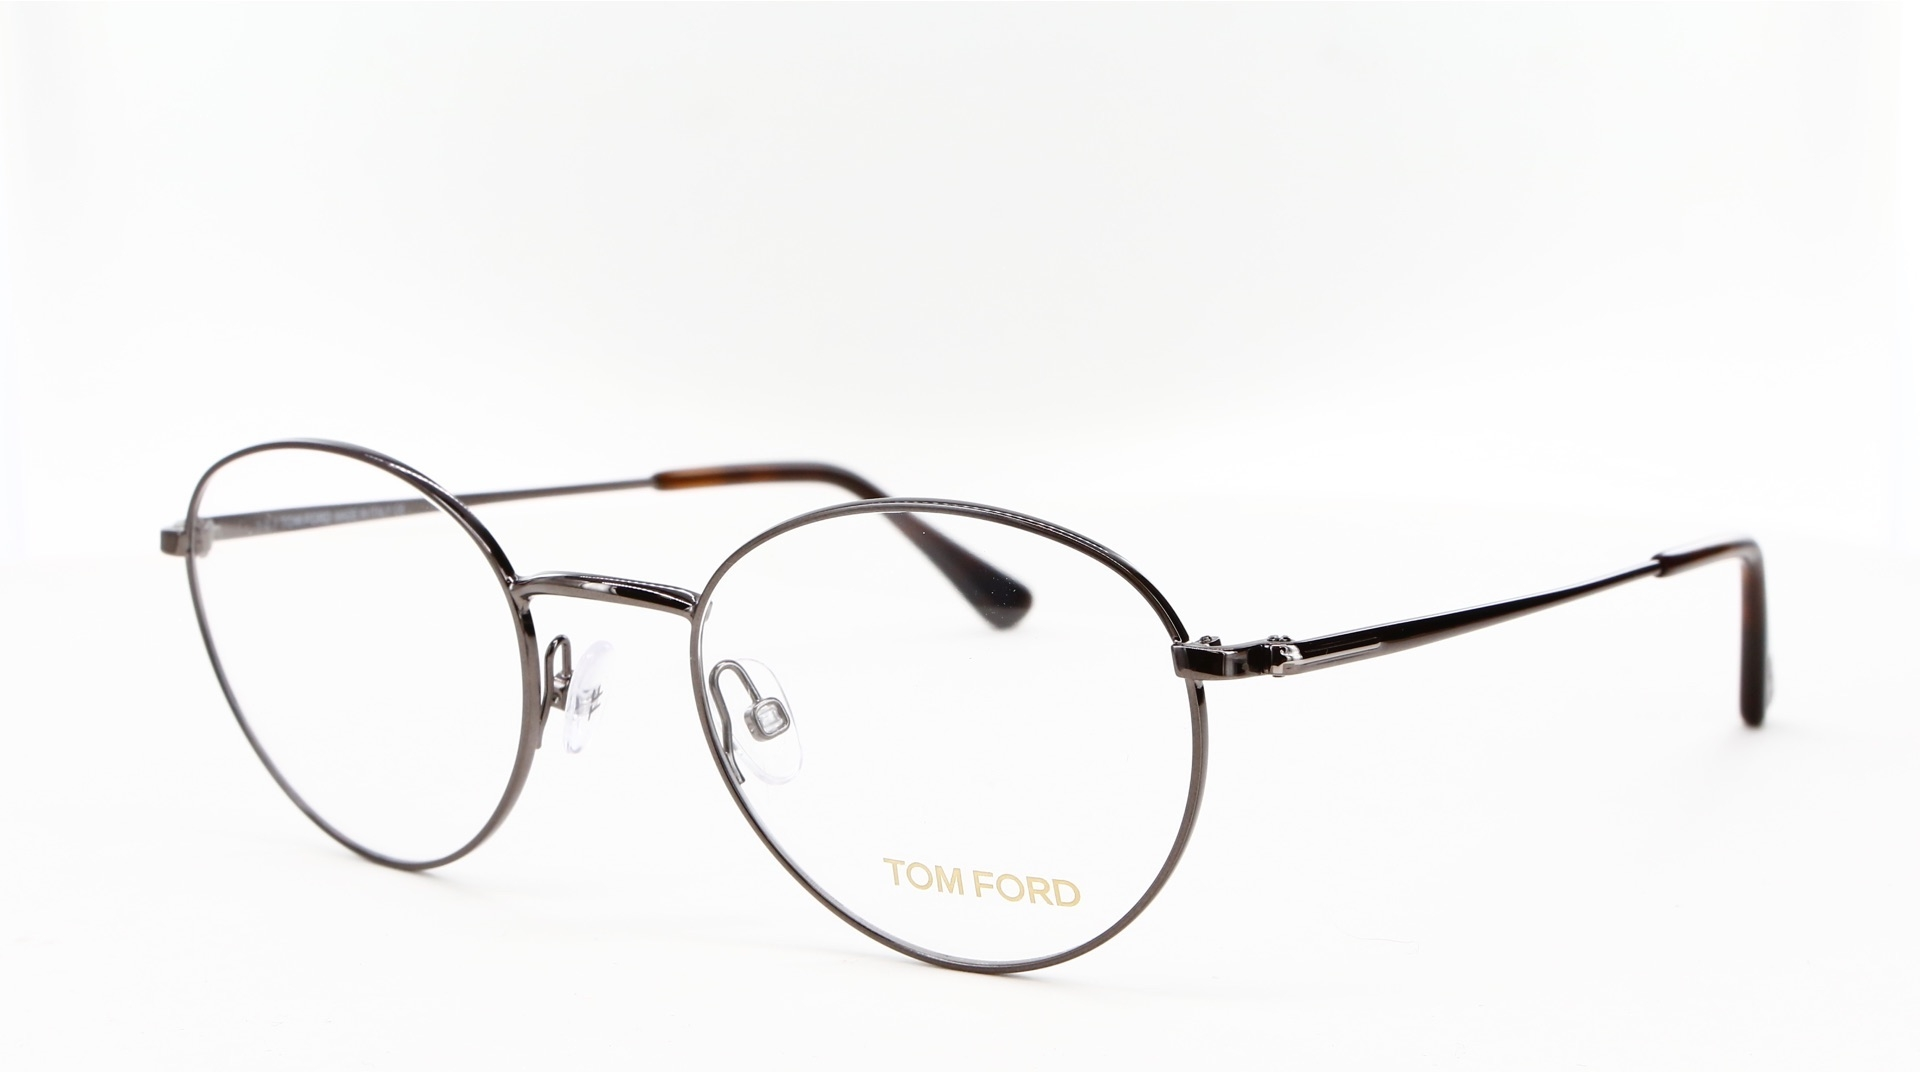 Tom Ford - ref: 79005